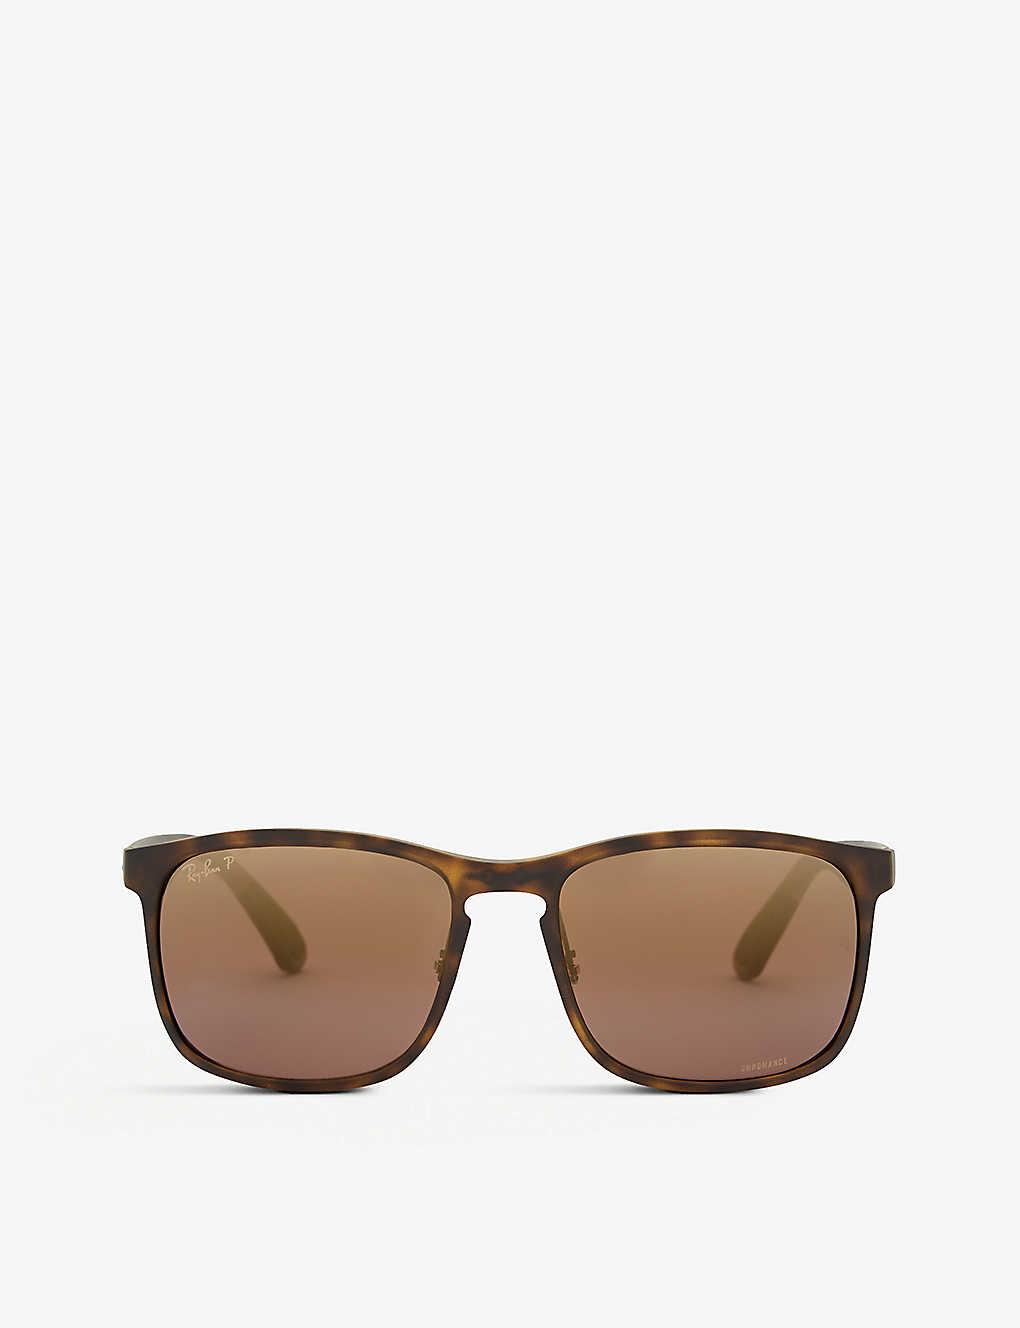 1796c41643f534 RB4264 Chromance® Havana square-frame sunglasses - Matte havana ...